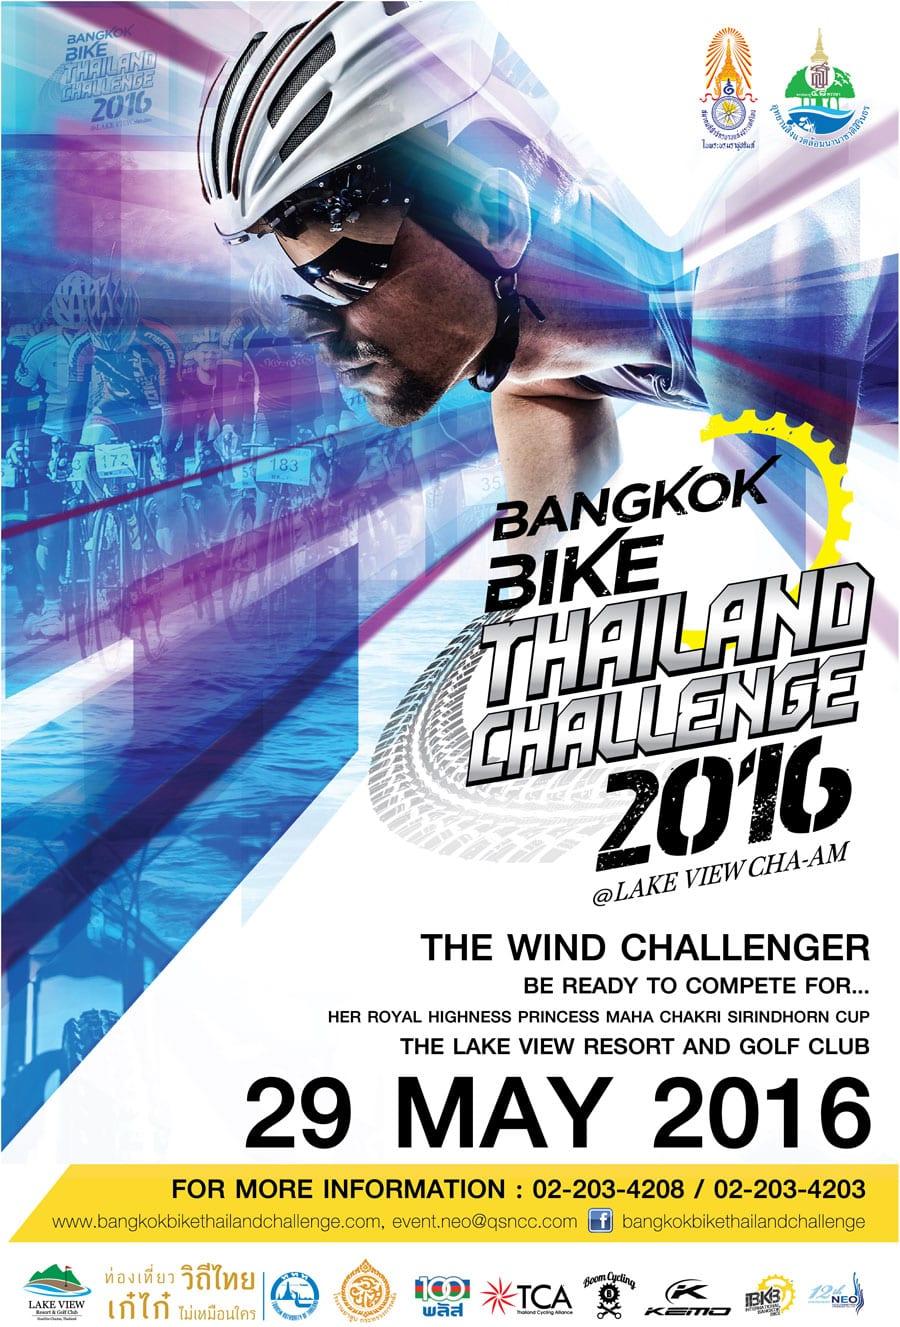 Bangkok Bike Thailand Challenge 2016@ Lake View Cha Am